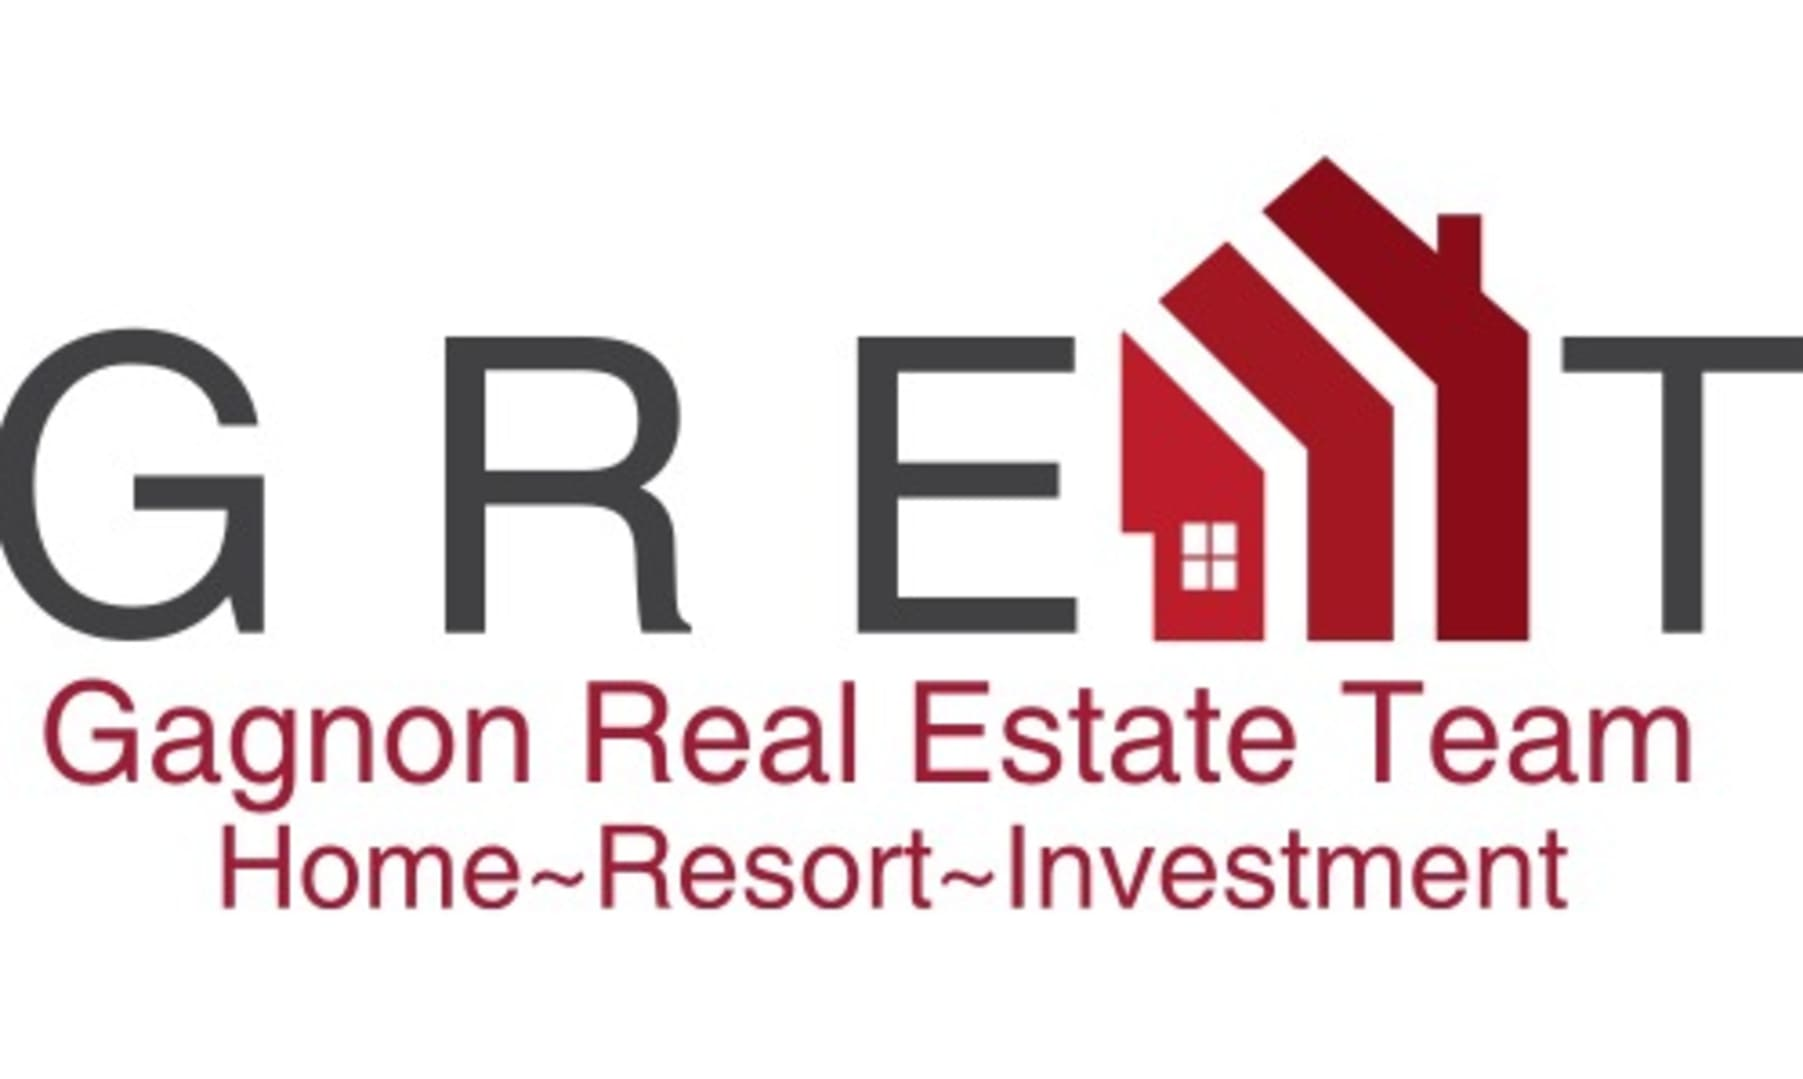 Listings Search - Gagnon Real Estate Team 9cc0529cfab